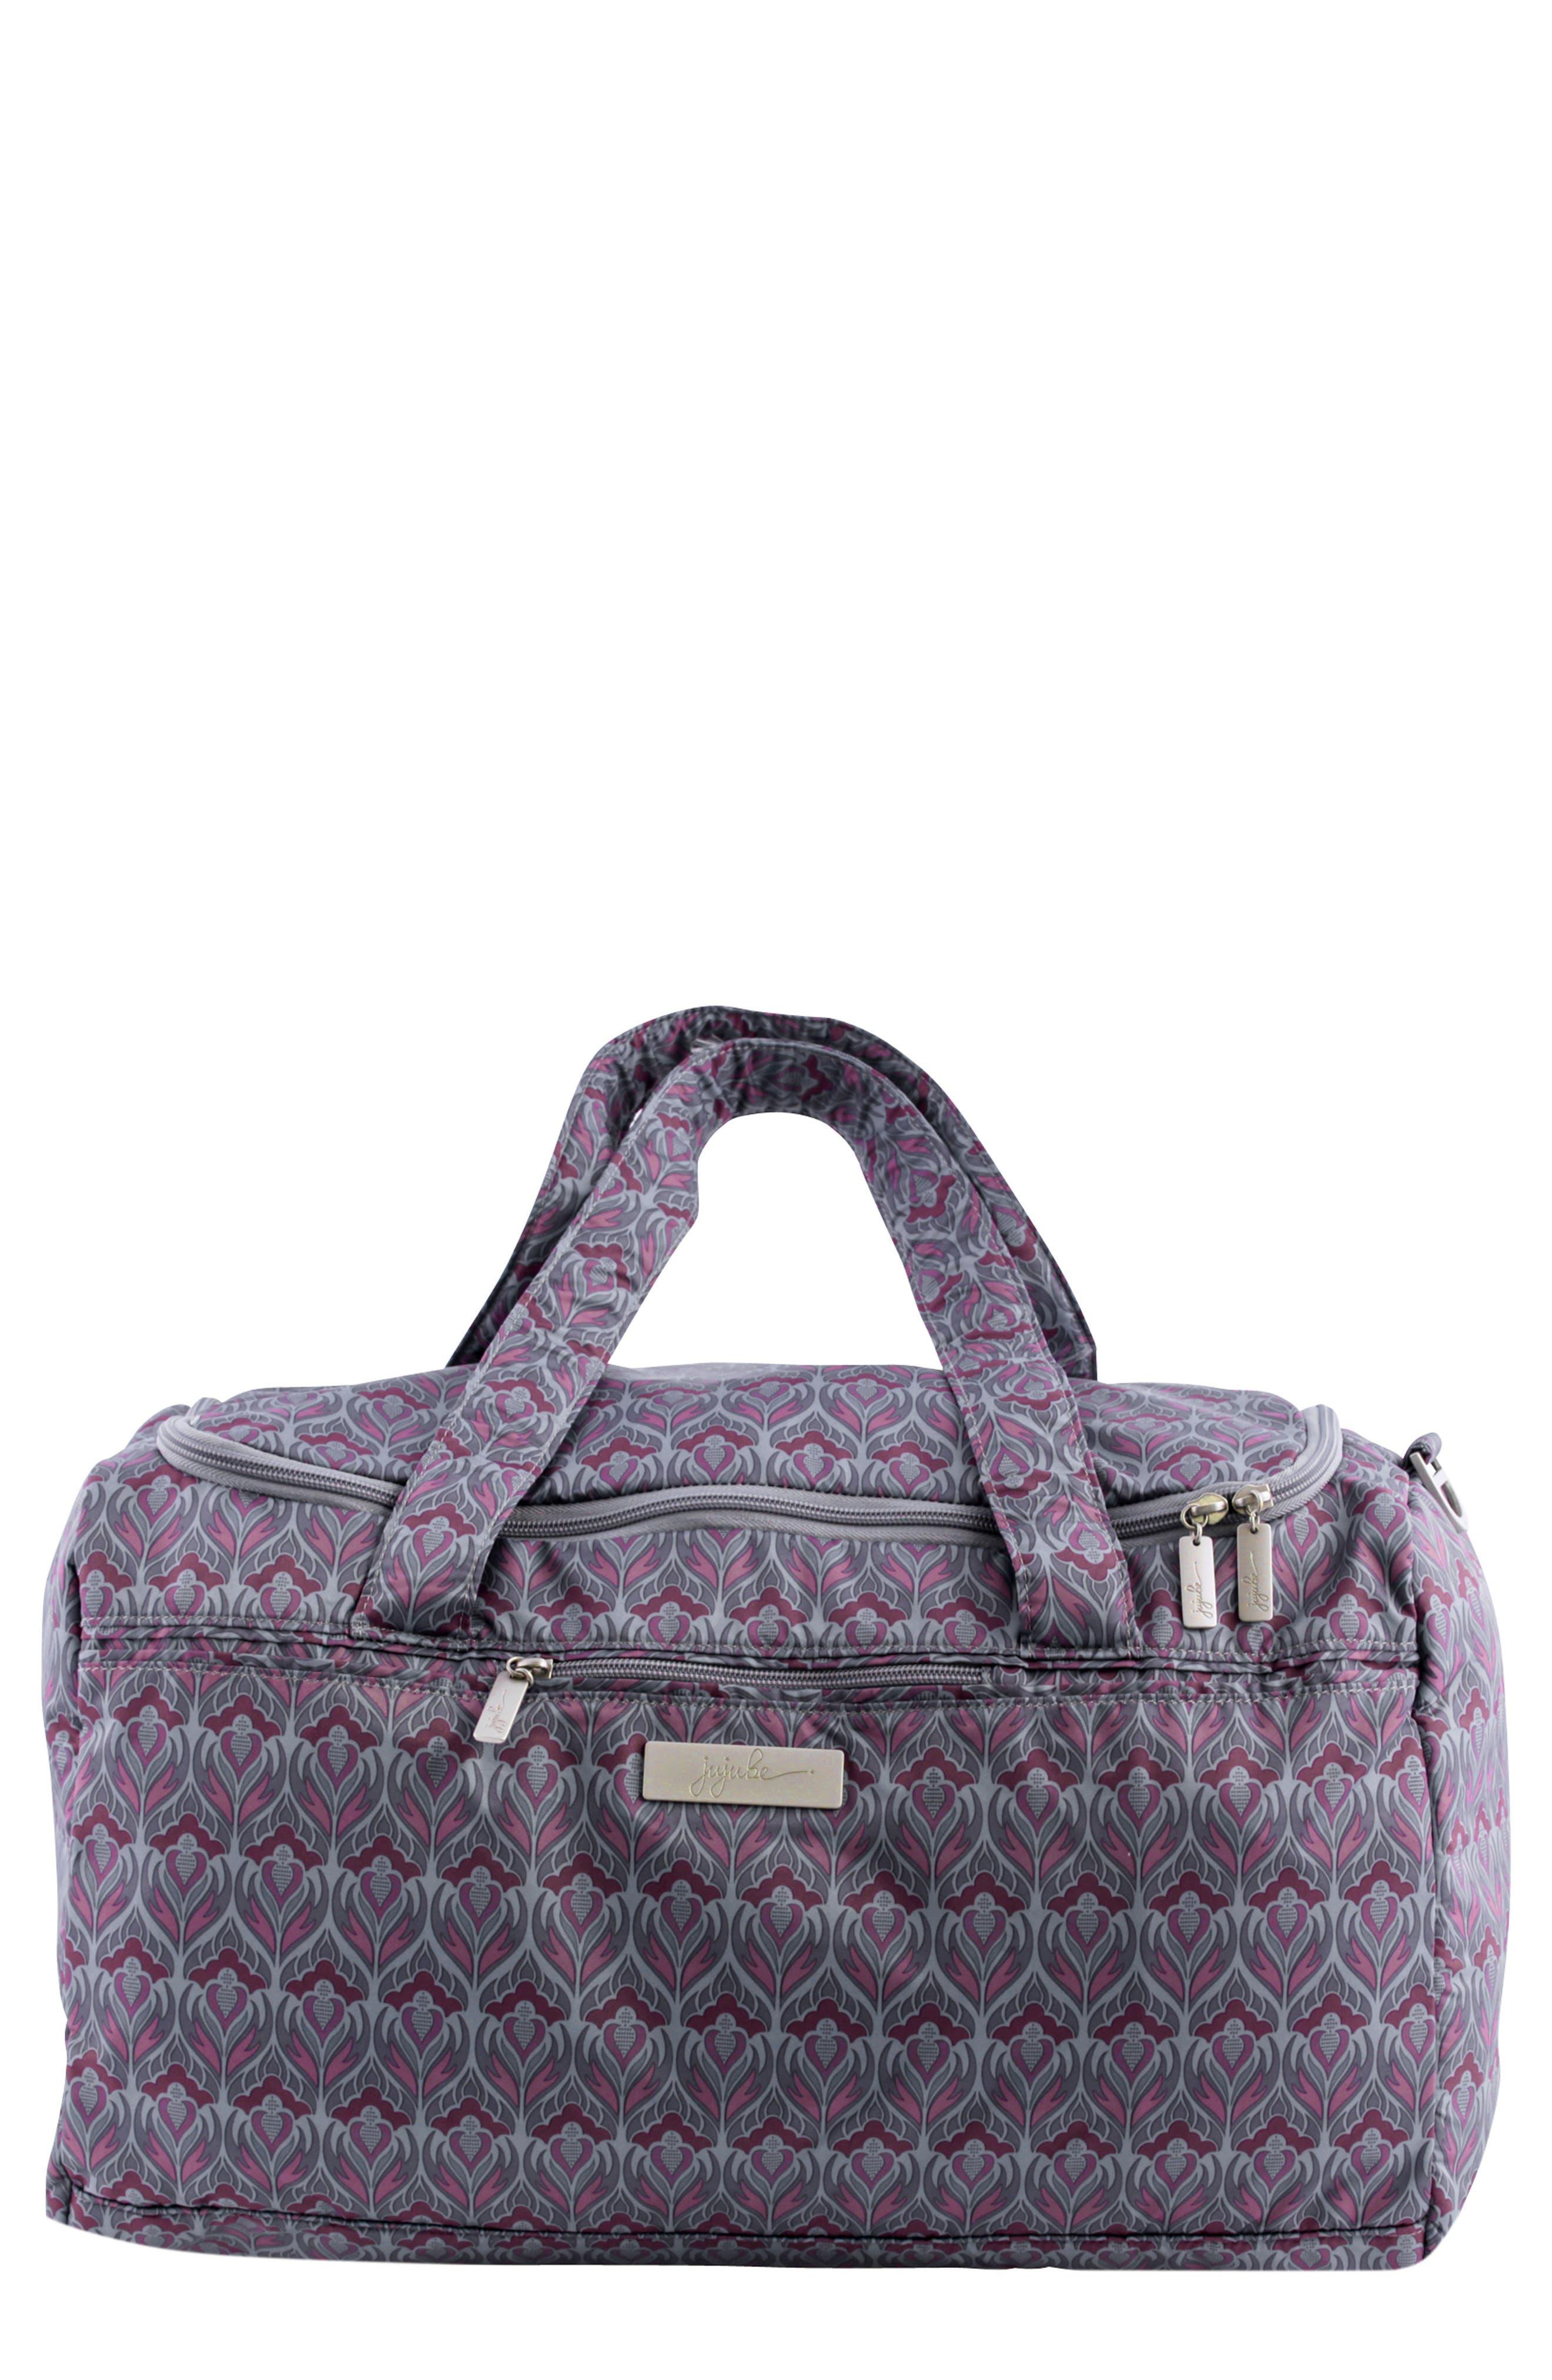 'Starlet' Travel Diaper Bag,                         Main,                         color, Amethyst Ice